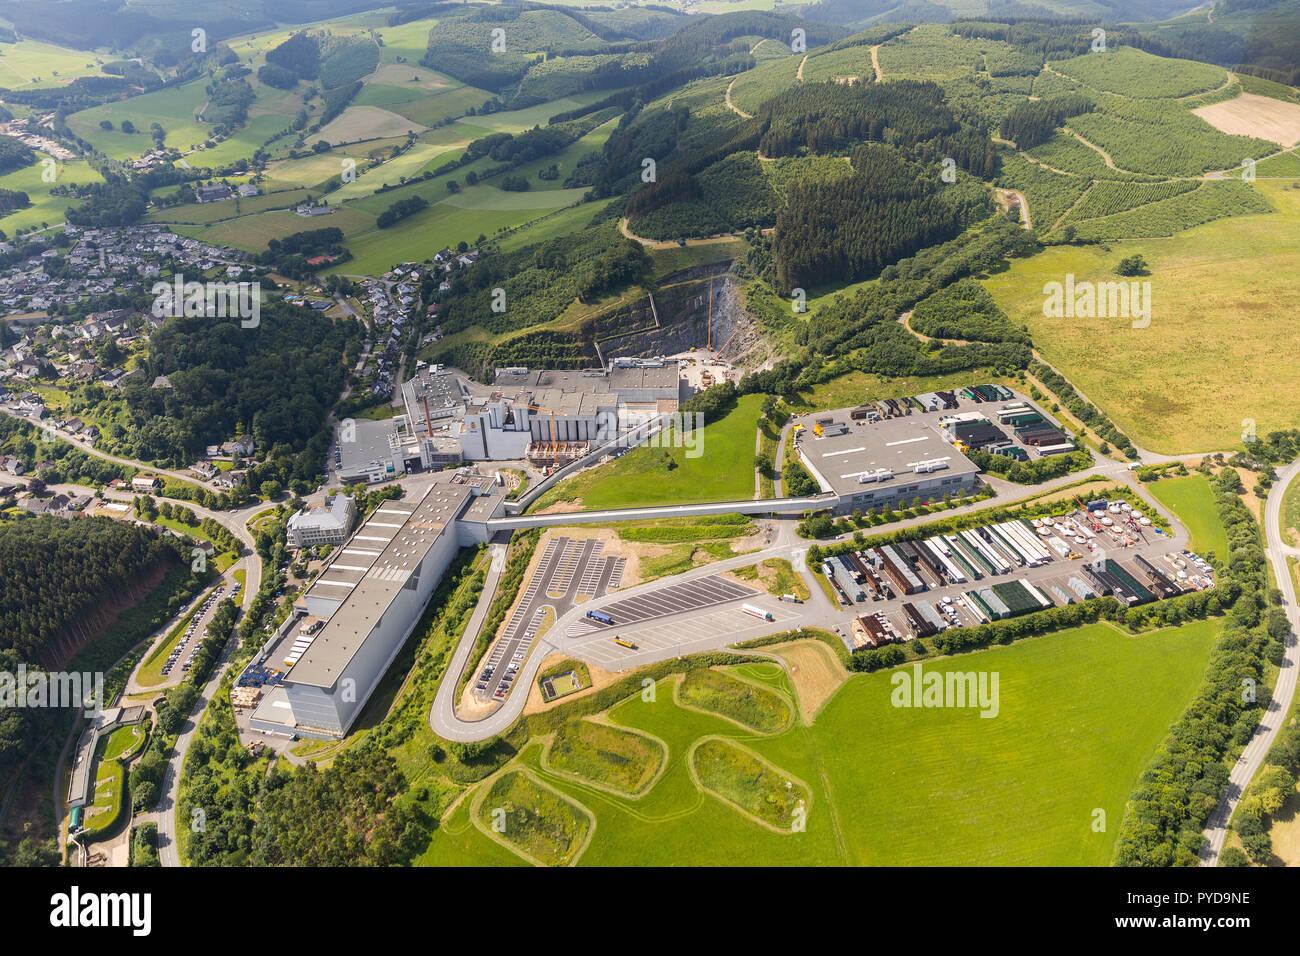 Aerial view, construction brewery C. & A. VELTINS GmbH & Co. KG, Grevenstein, Meschede, Sauerland, North Rhine-Westphalia, Germany, DEU, Europe, birds - Stock Image